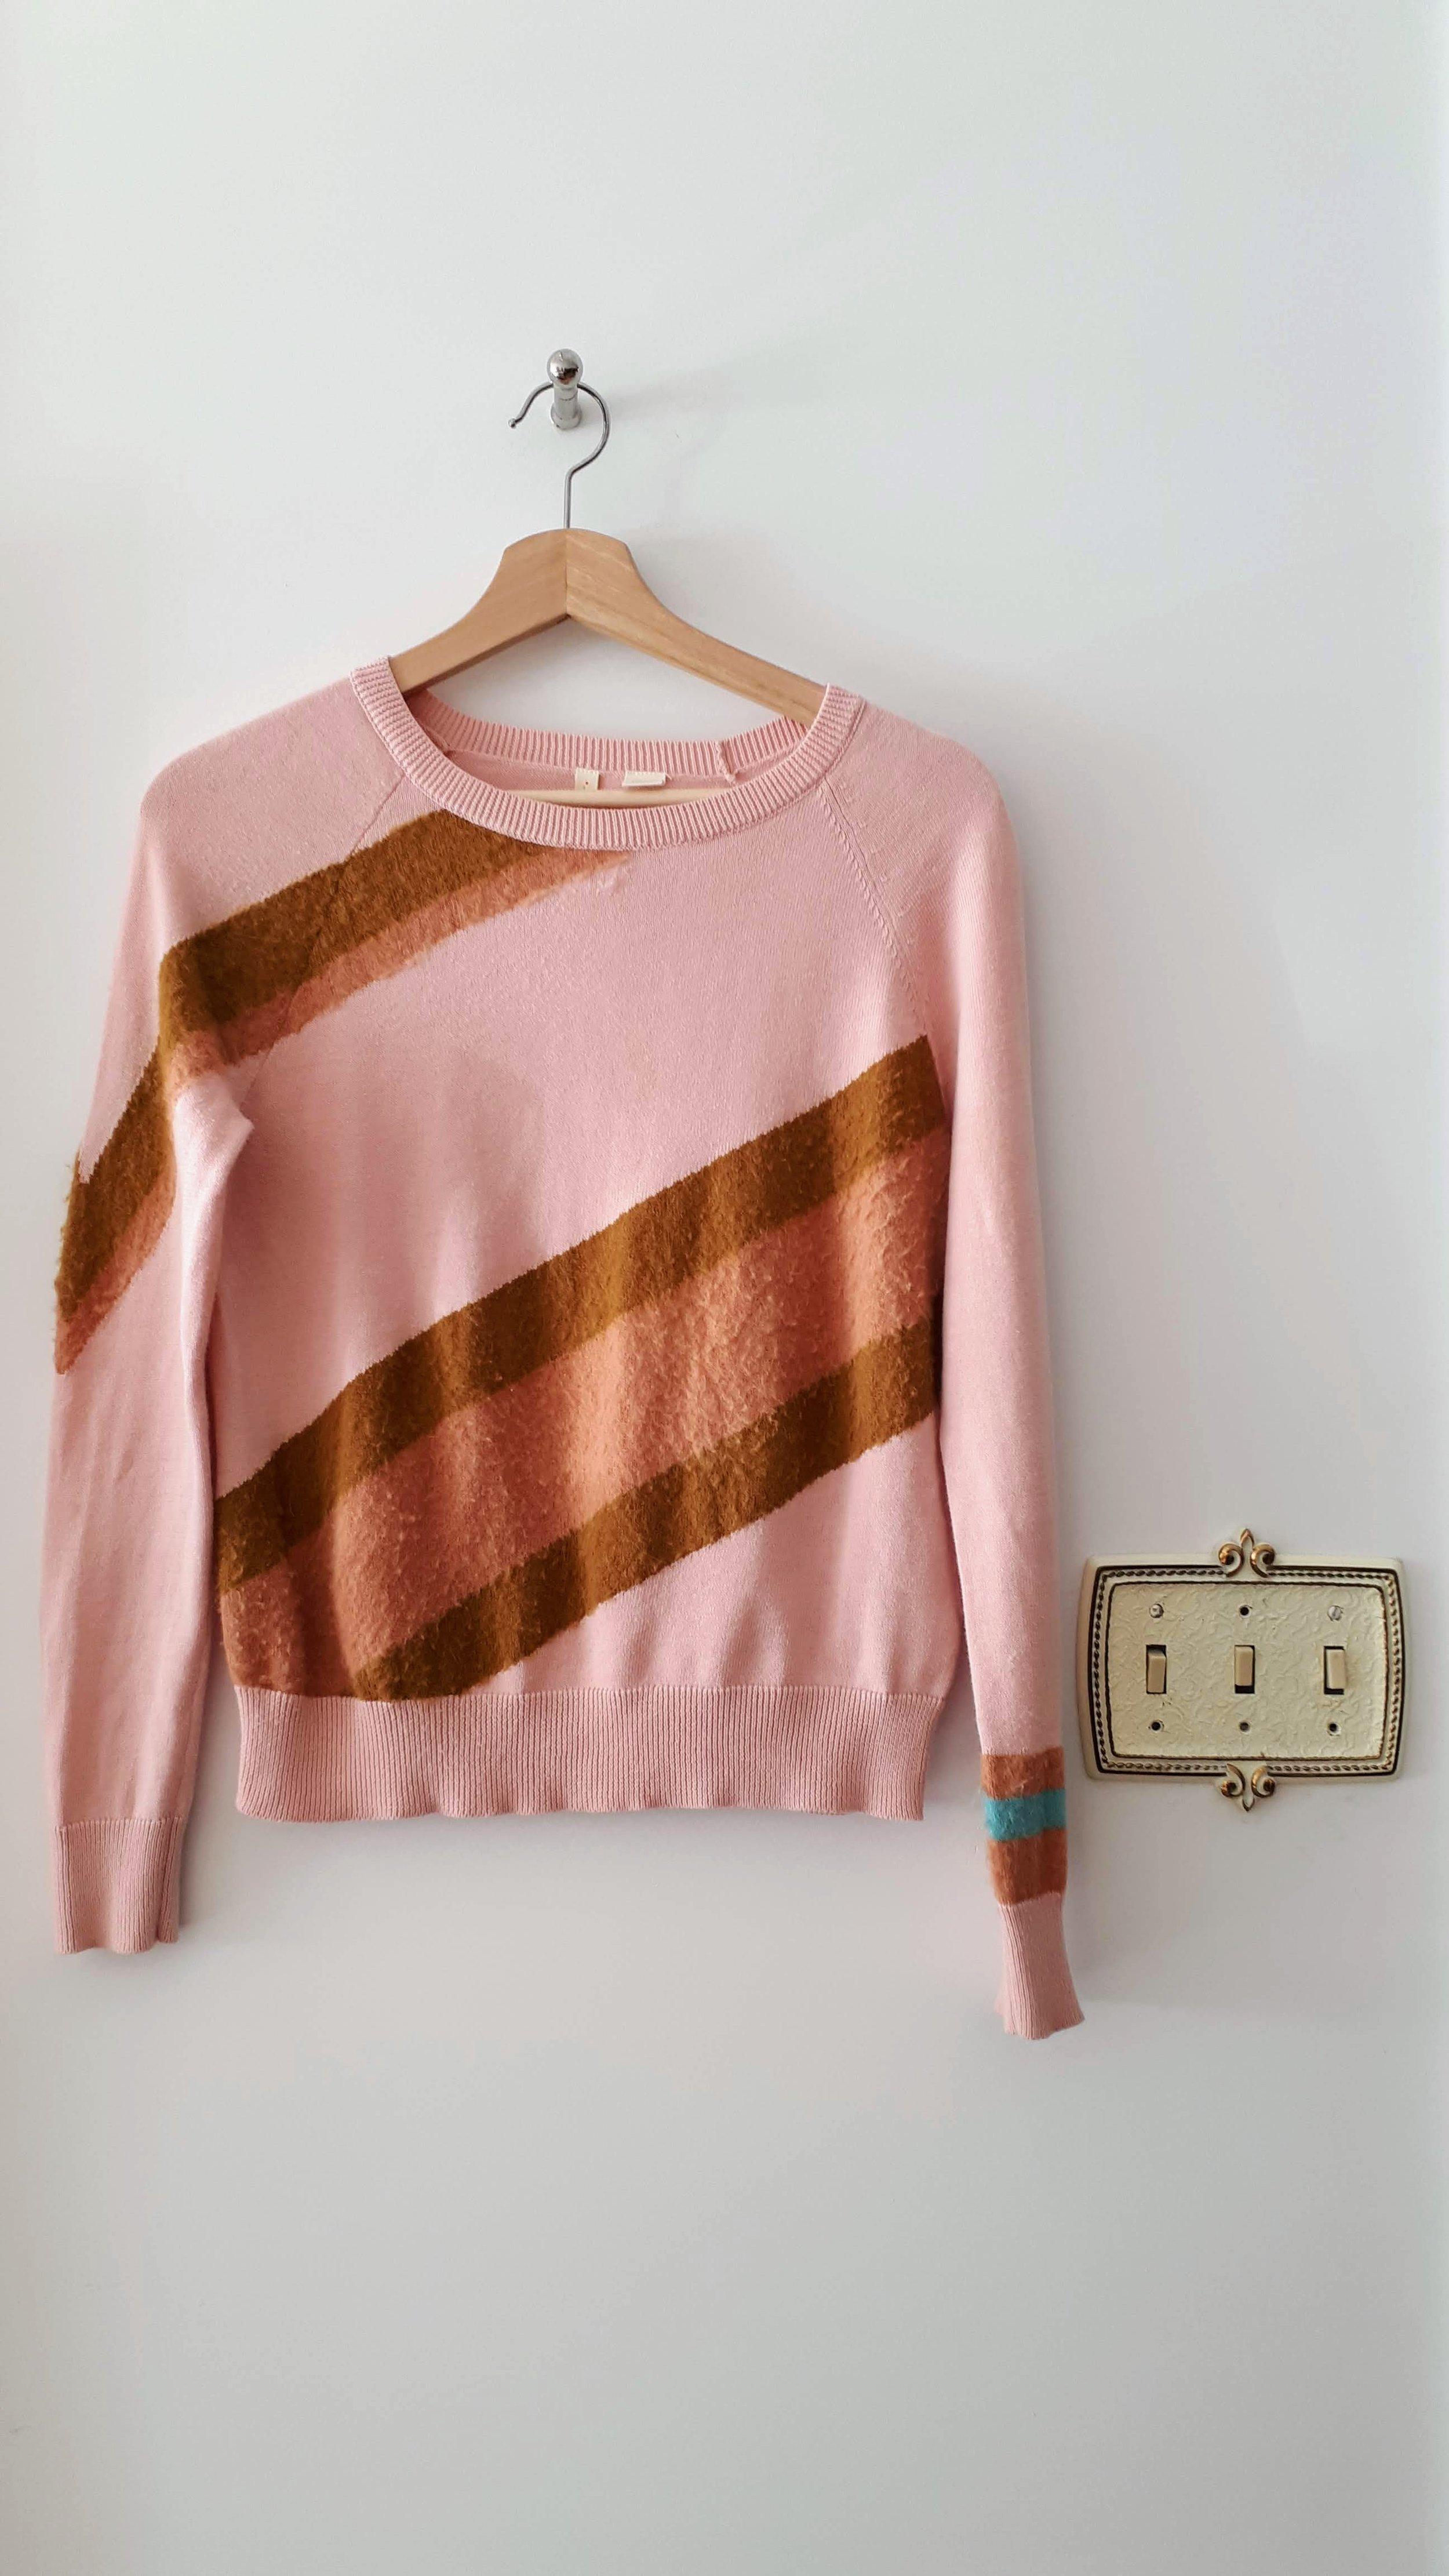 Moth top; Size XS, $22